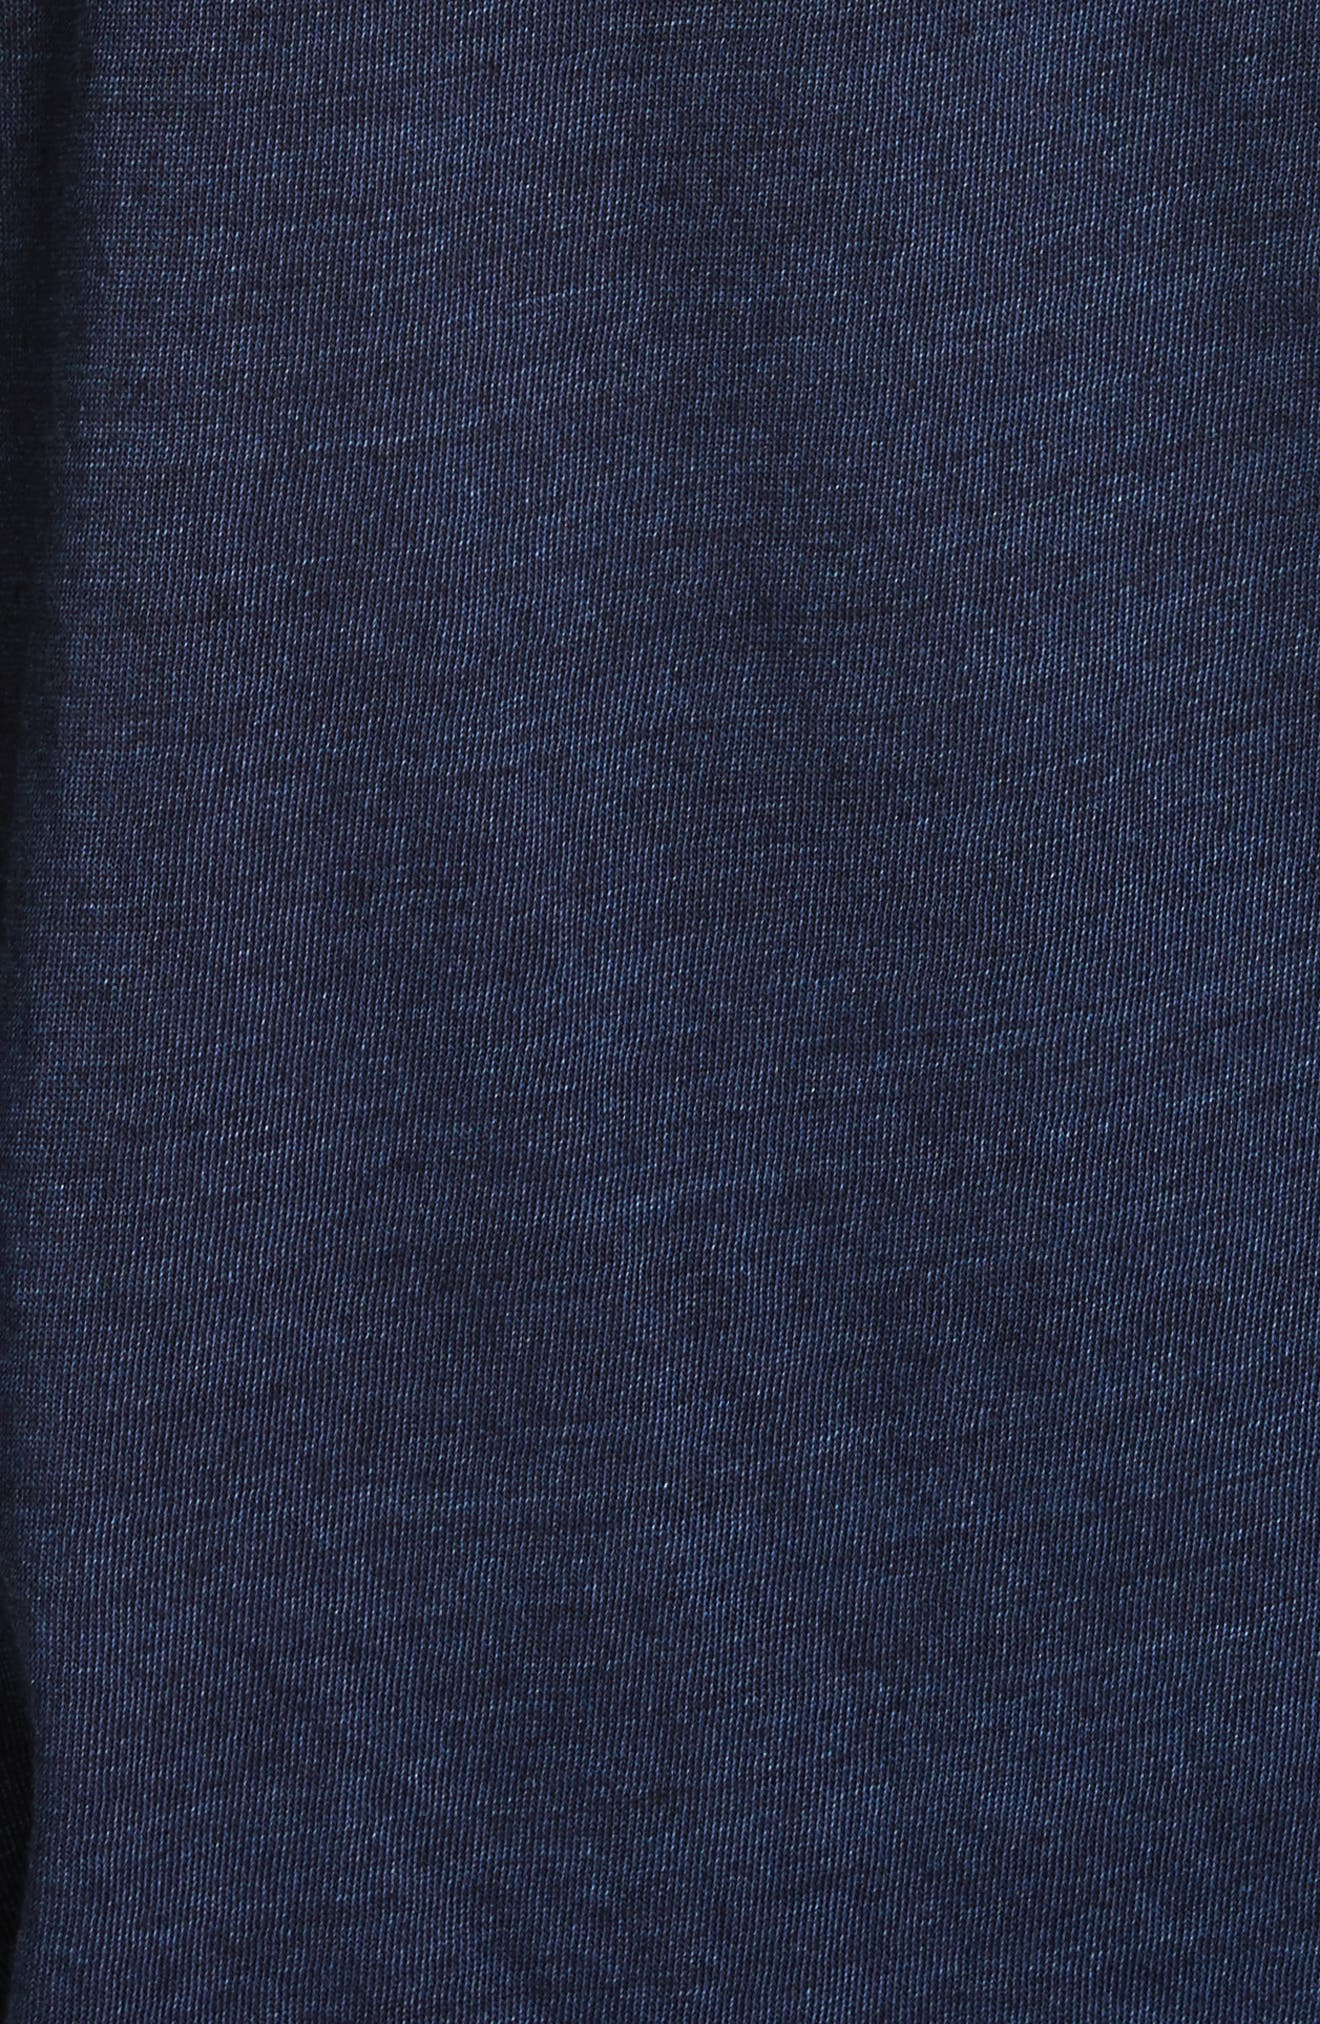 Faylen Blouson Knit Dress,                             Alternate thumbnail 5, color,                             487